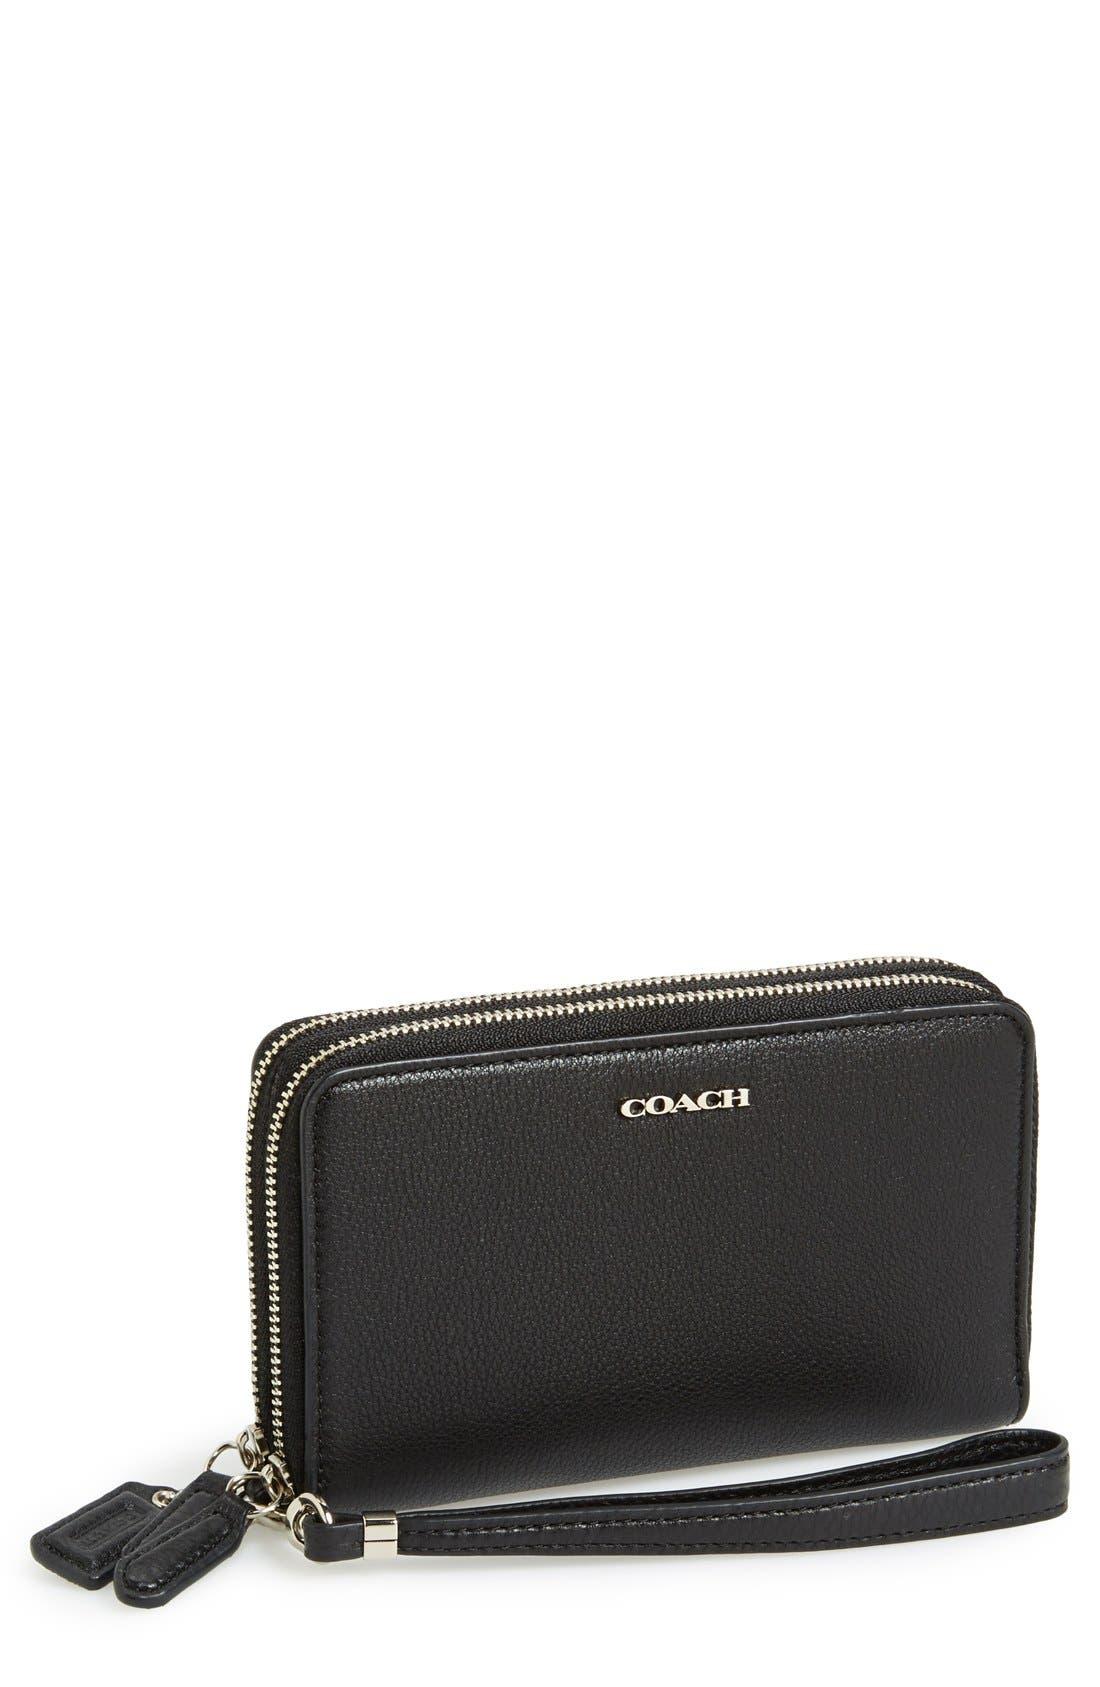 Main Image - COACH 'Madison' Zip Around Leather Phone Wristlet